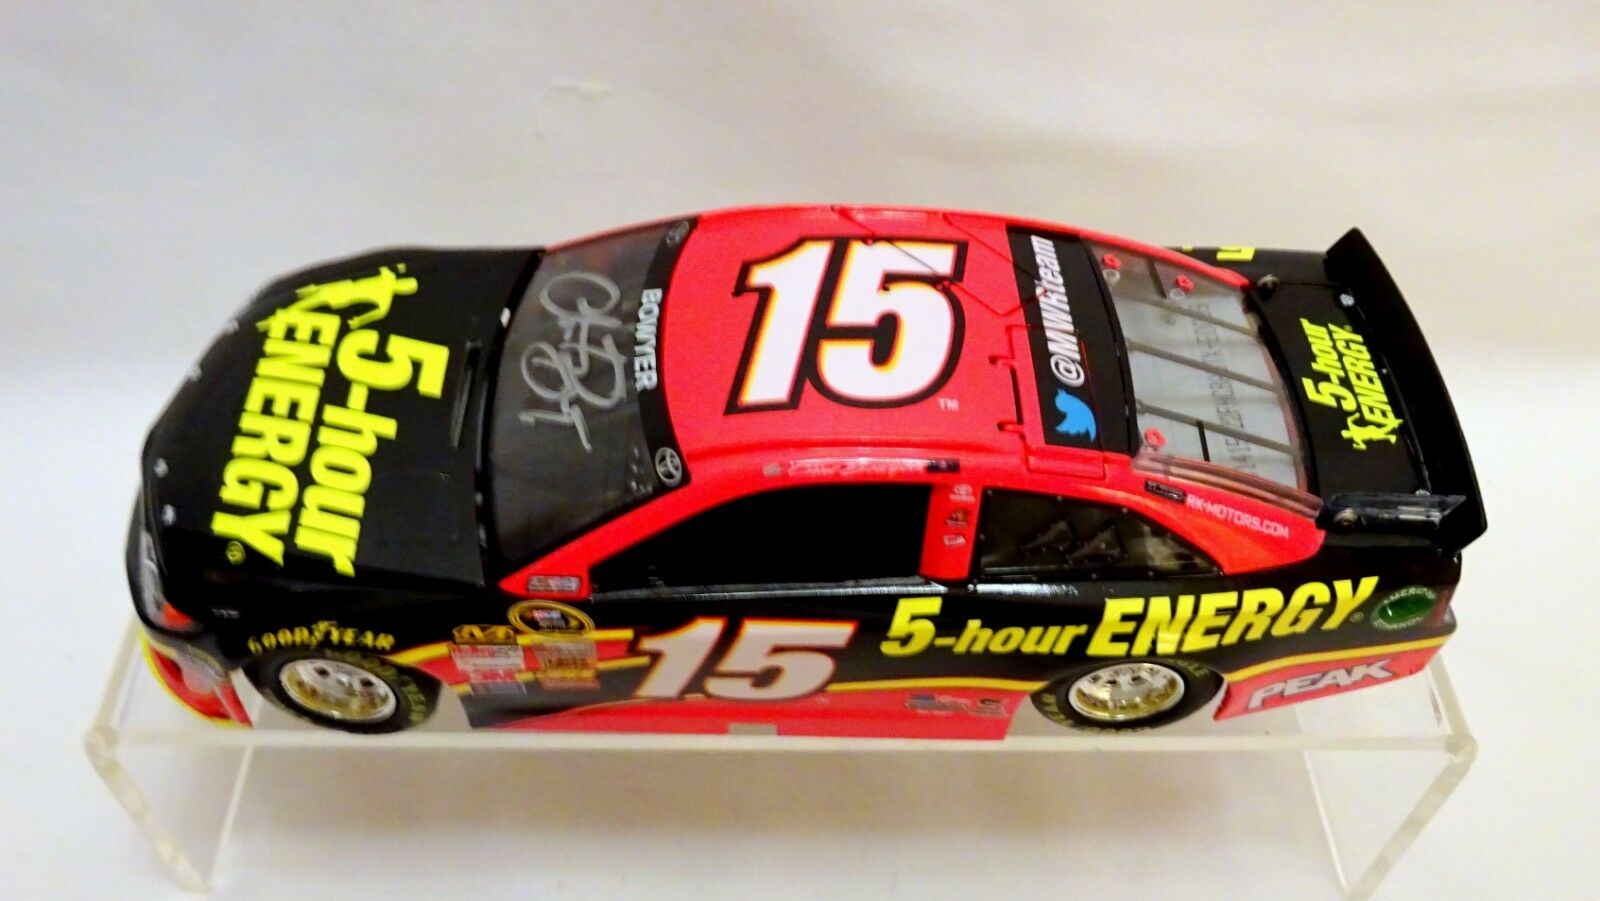 CLINT BOWER NASCAR LIONEL 2014 5-hour ENERGY CAMRY AUTOGRAPHED    (26)